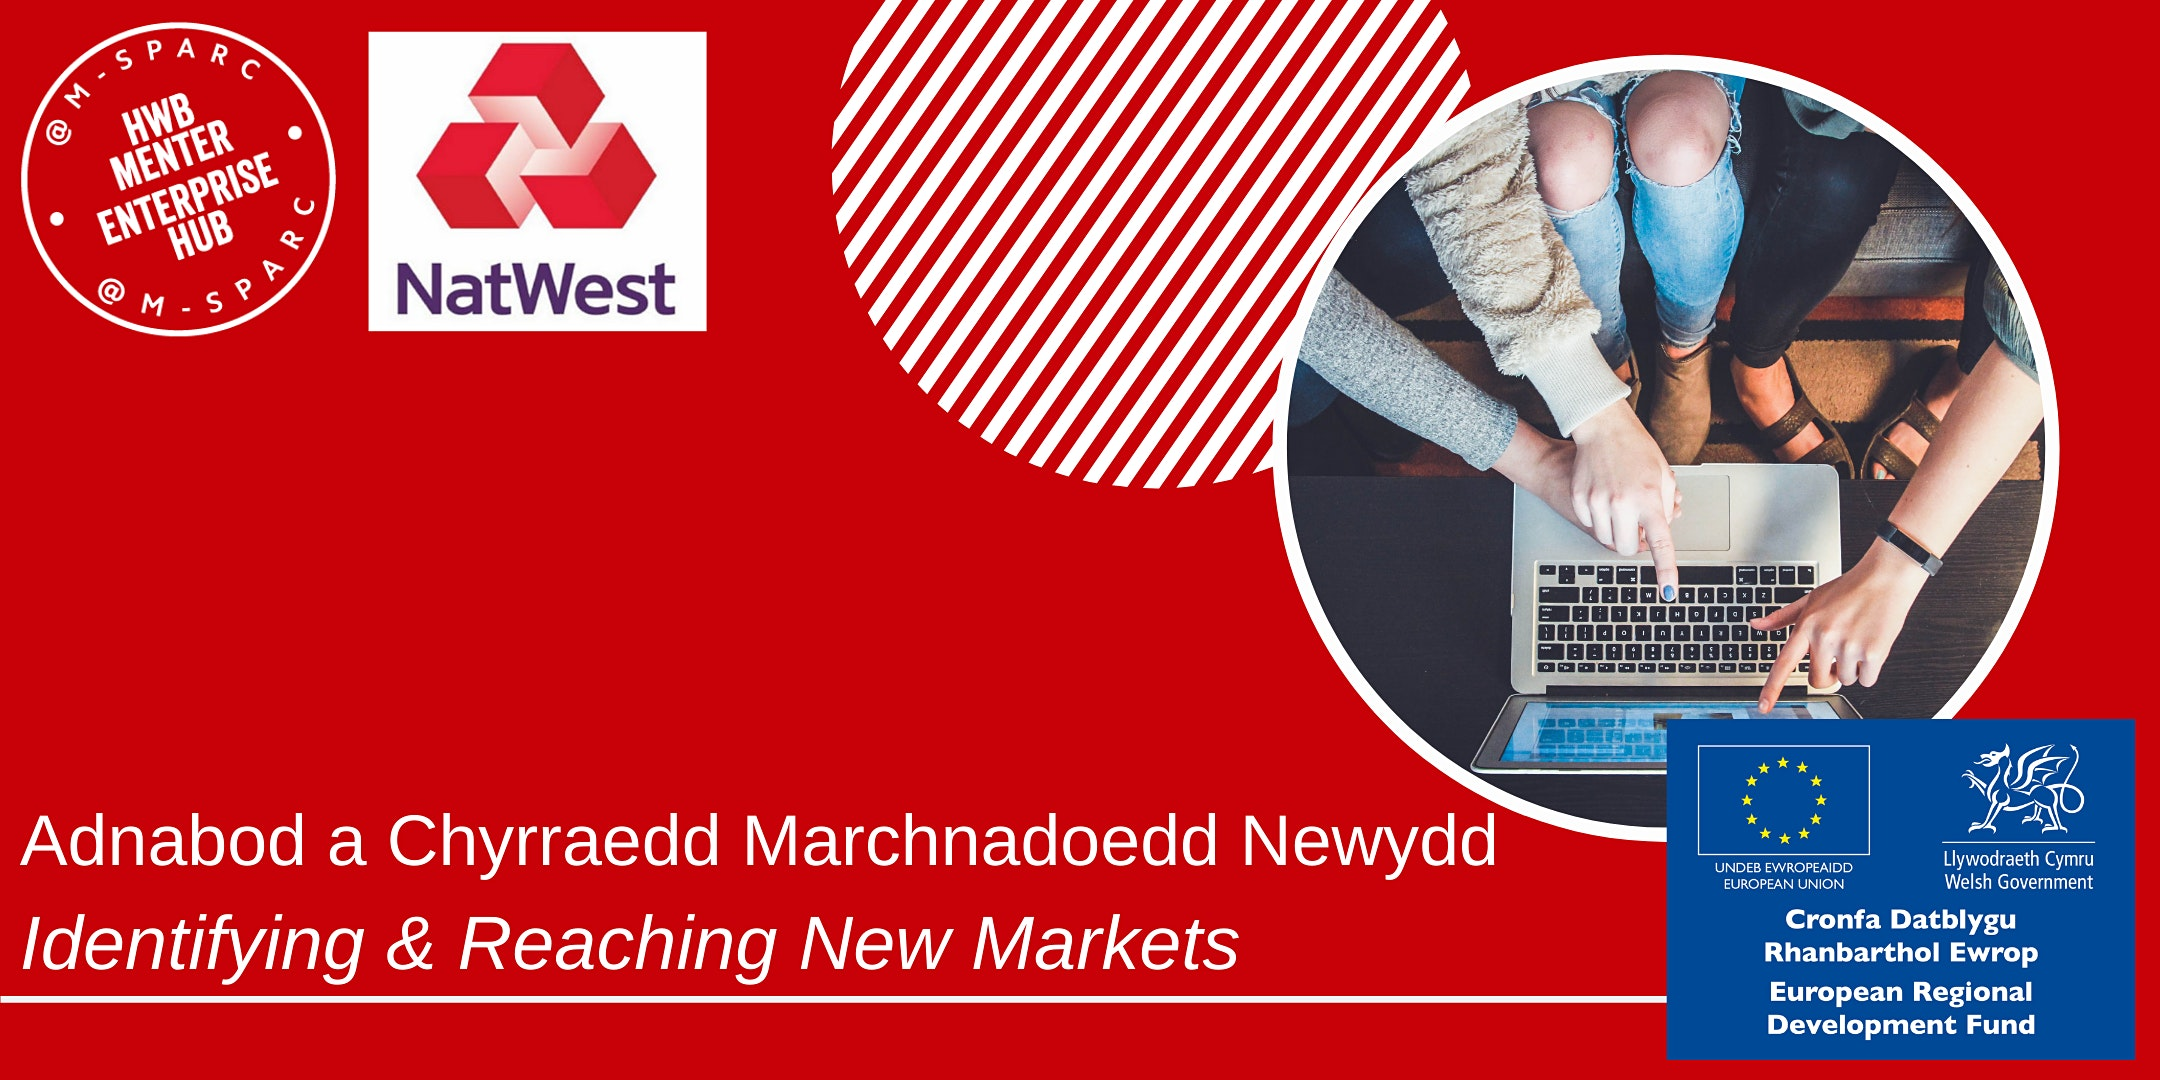 ONLINE - Adnabod Marchnadoedd Newydd /Identifying & Reaching New Markets